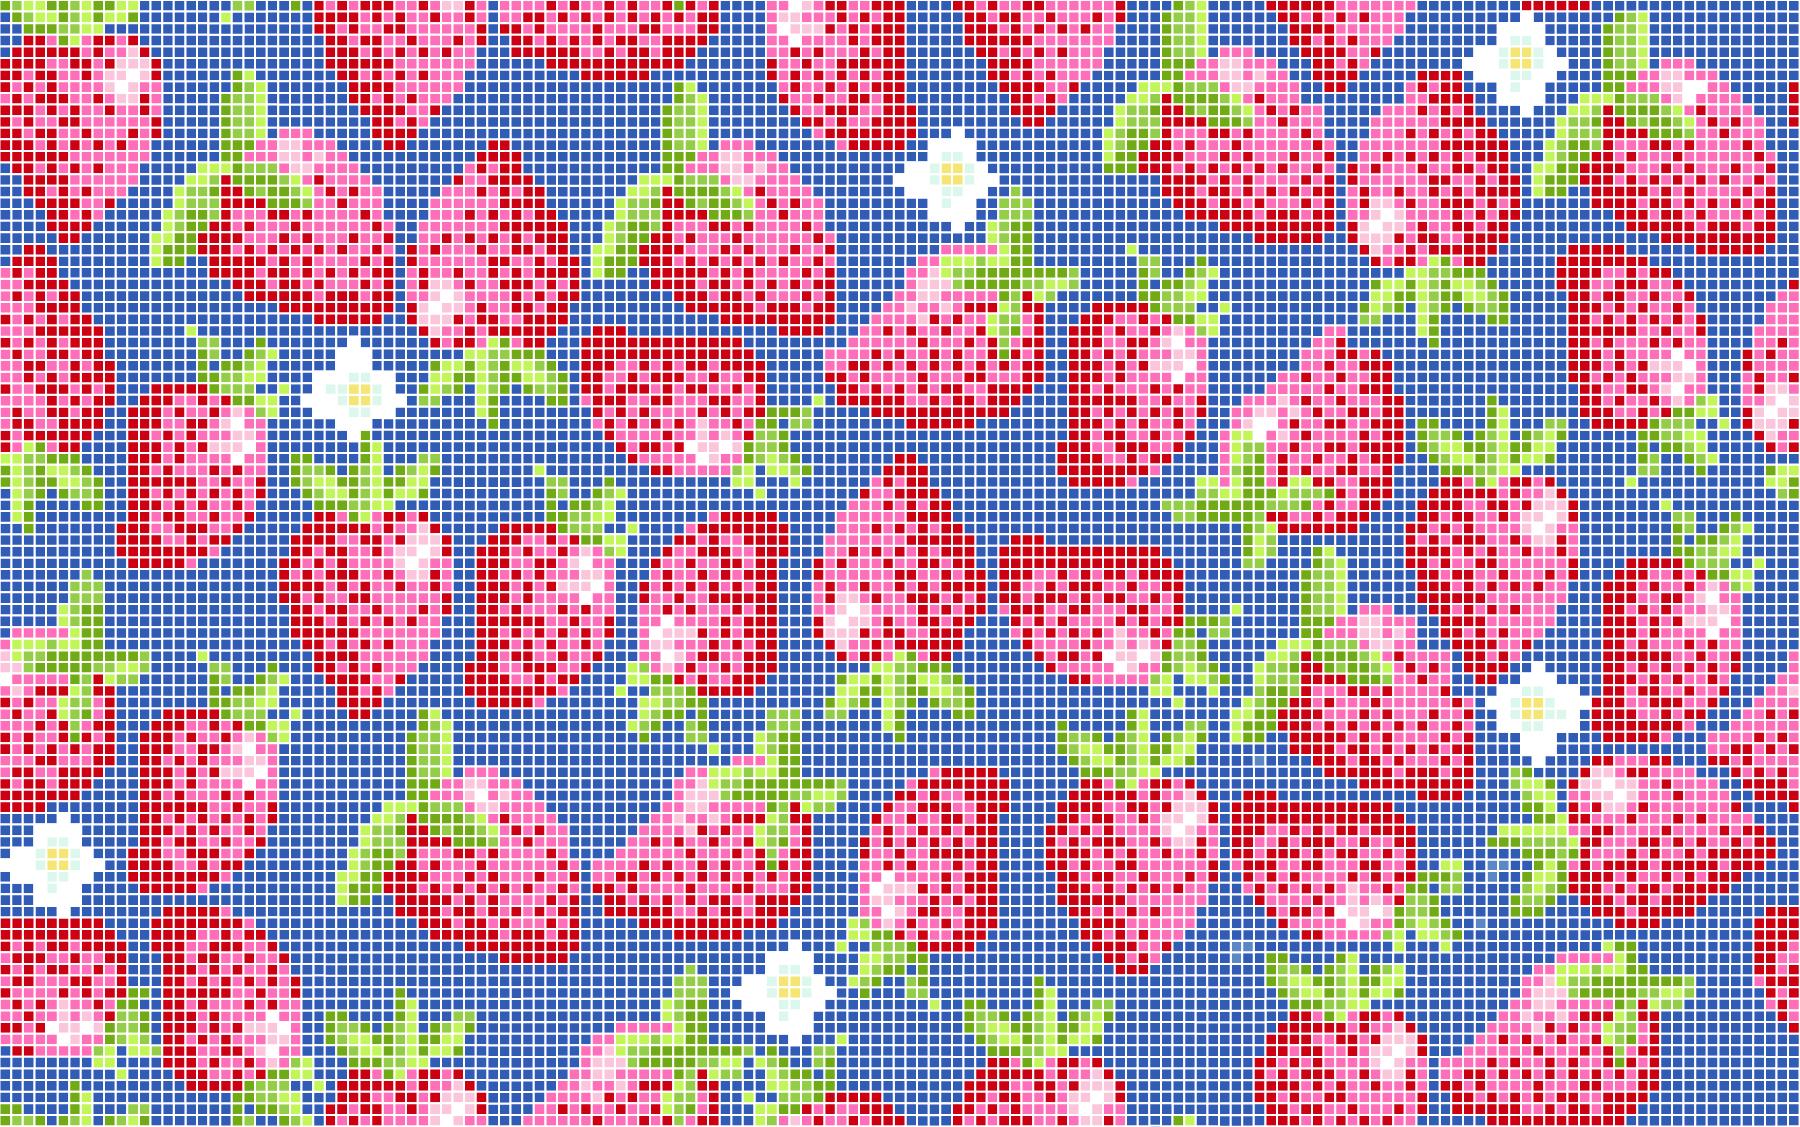 strawberries navy 6 inch-01.jpg